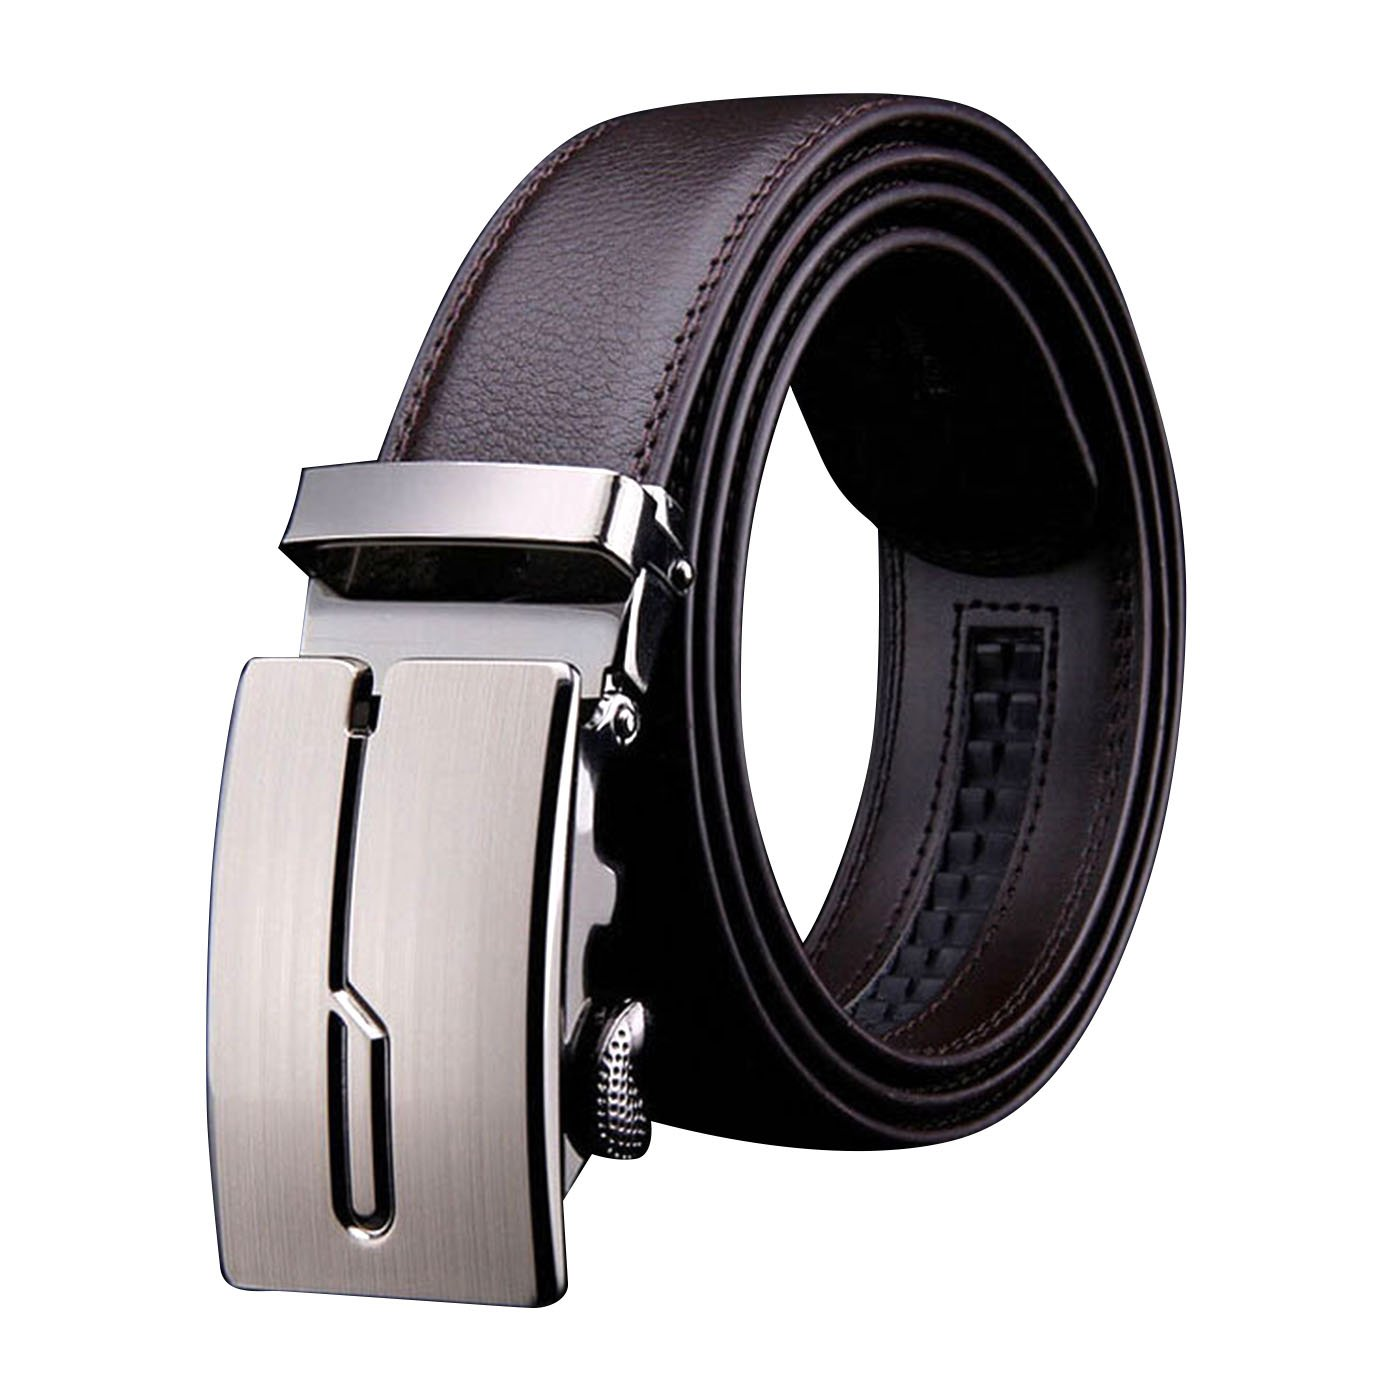 H-Time Men's Leather Ratchet Belt, Automatic Sliding Buckle Dress Belt for Men